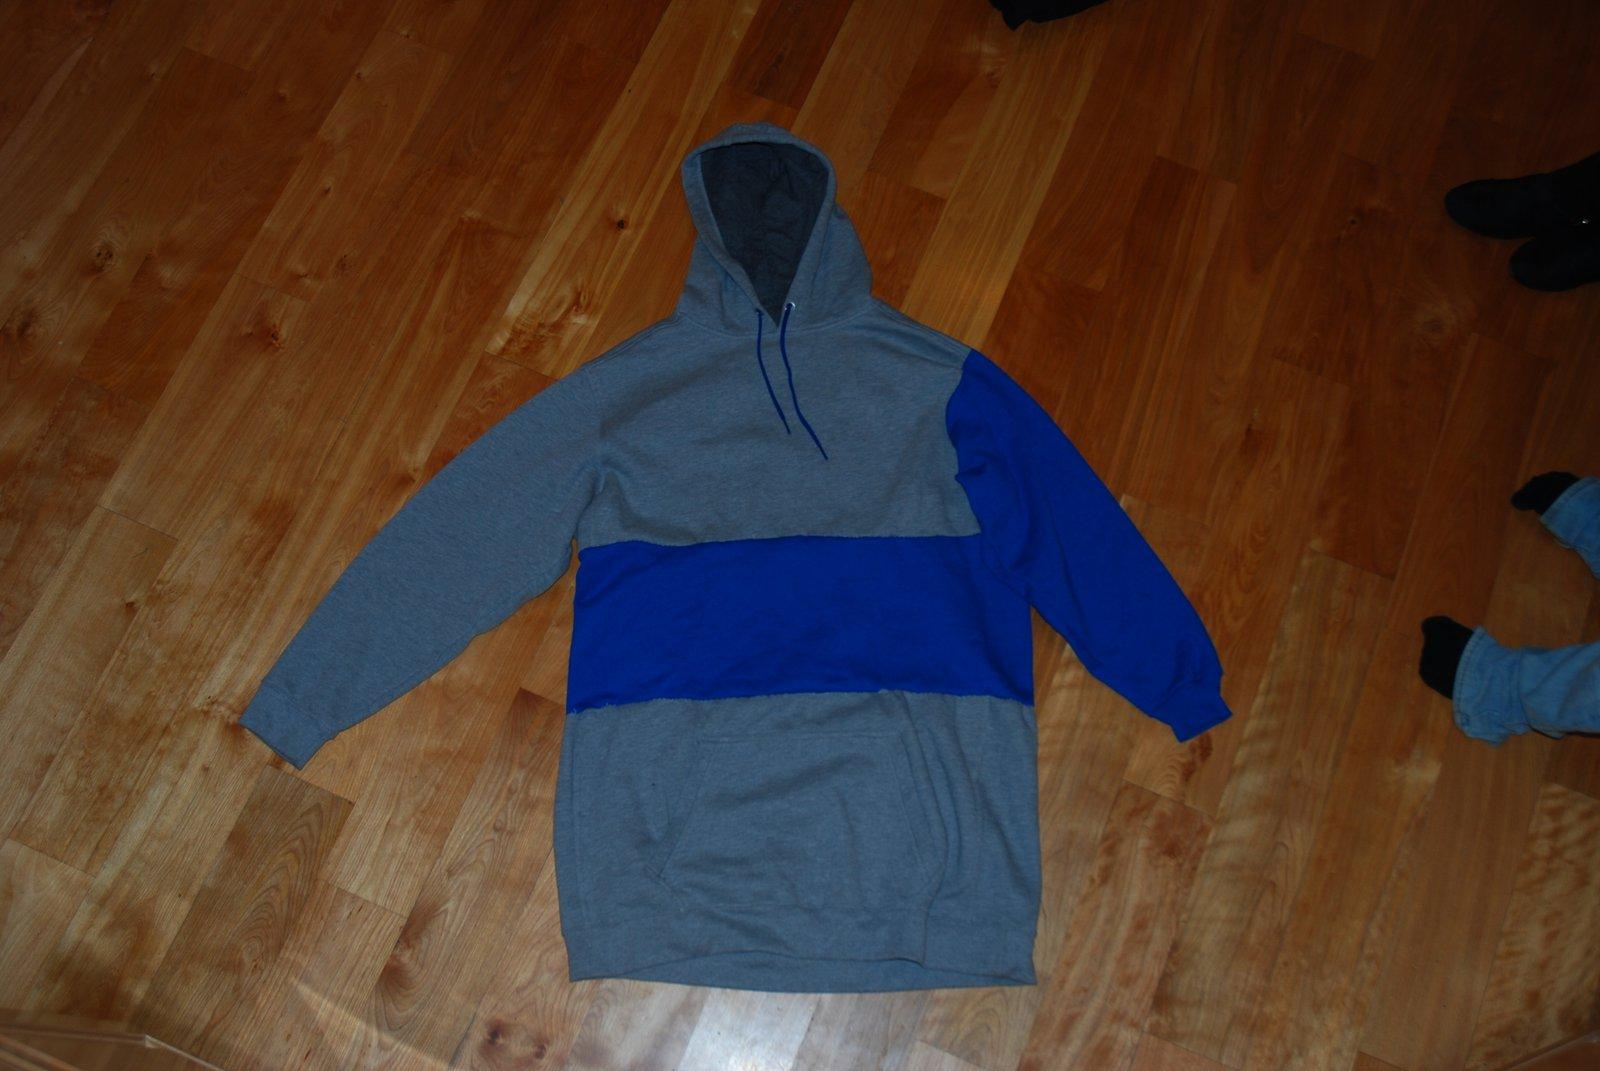 Custom tall hoody for sale